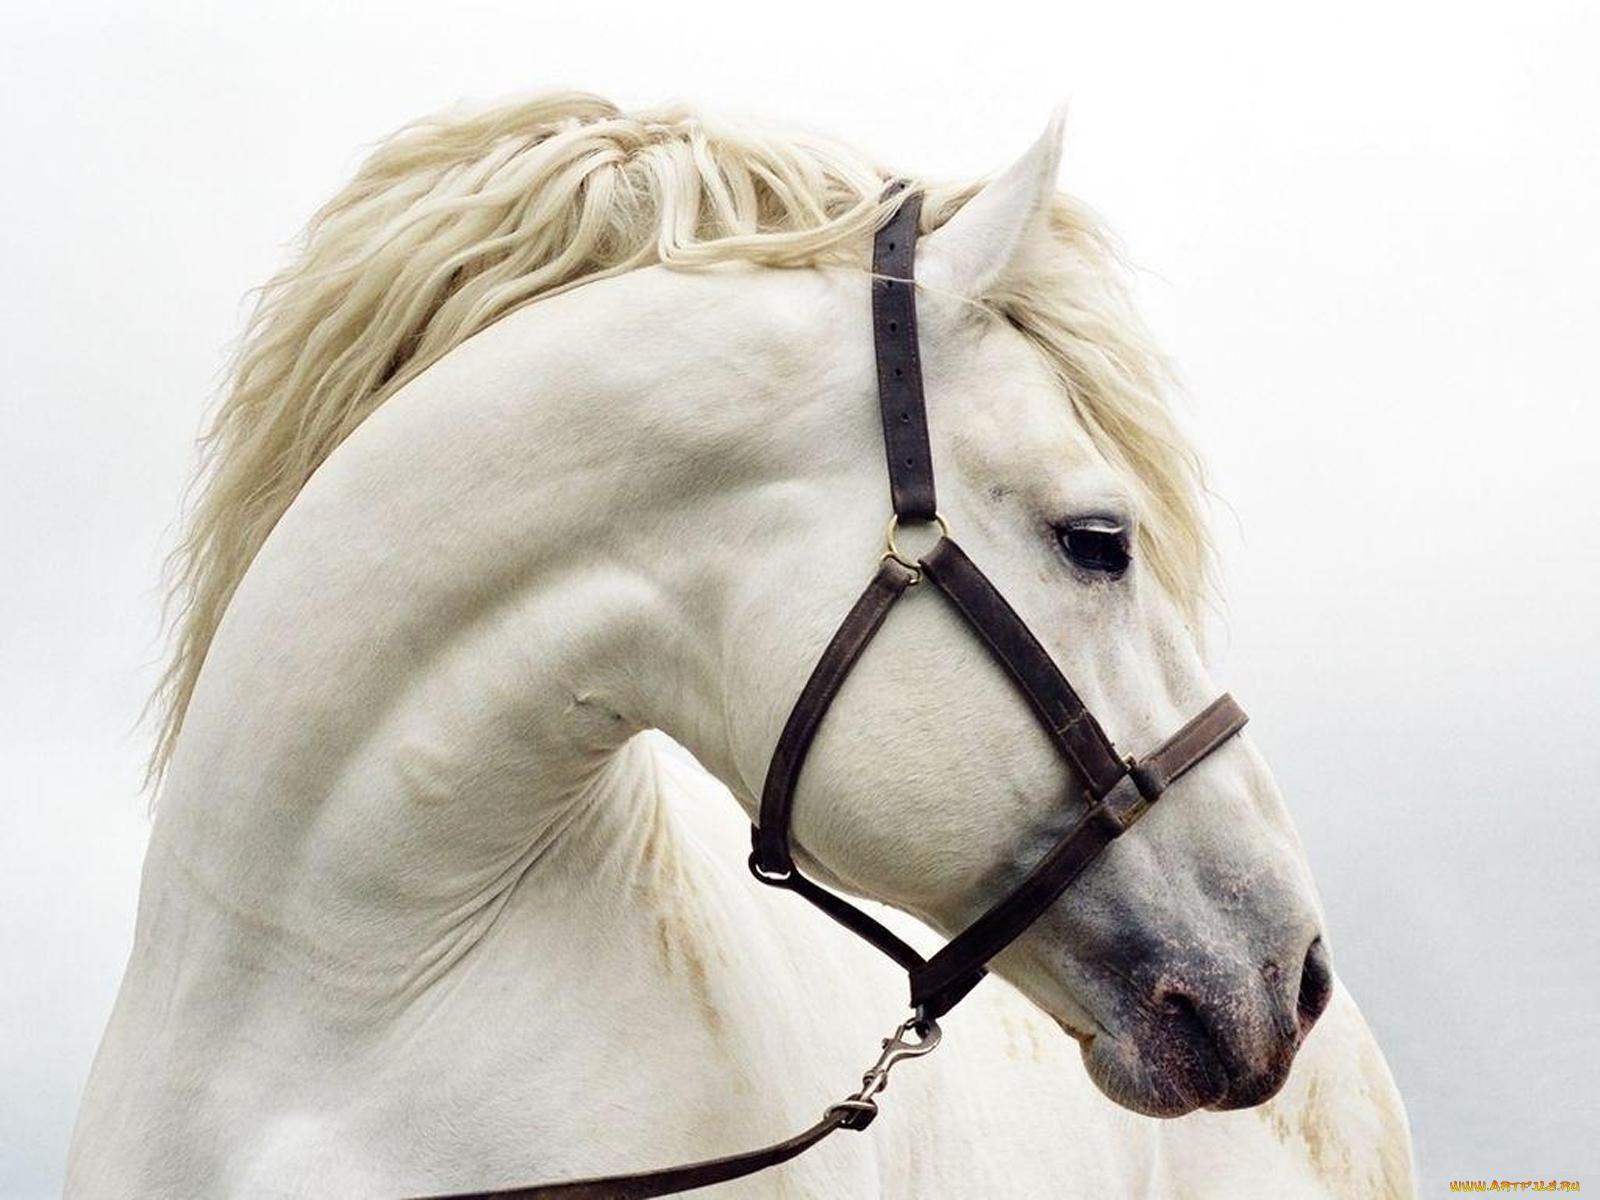 , фотографии животные, лошади, лошадь ...: www.artfile.ru/i.php?i=654954